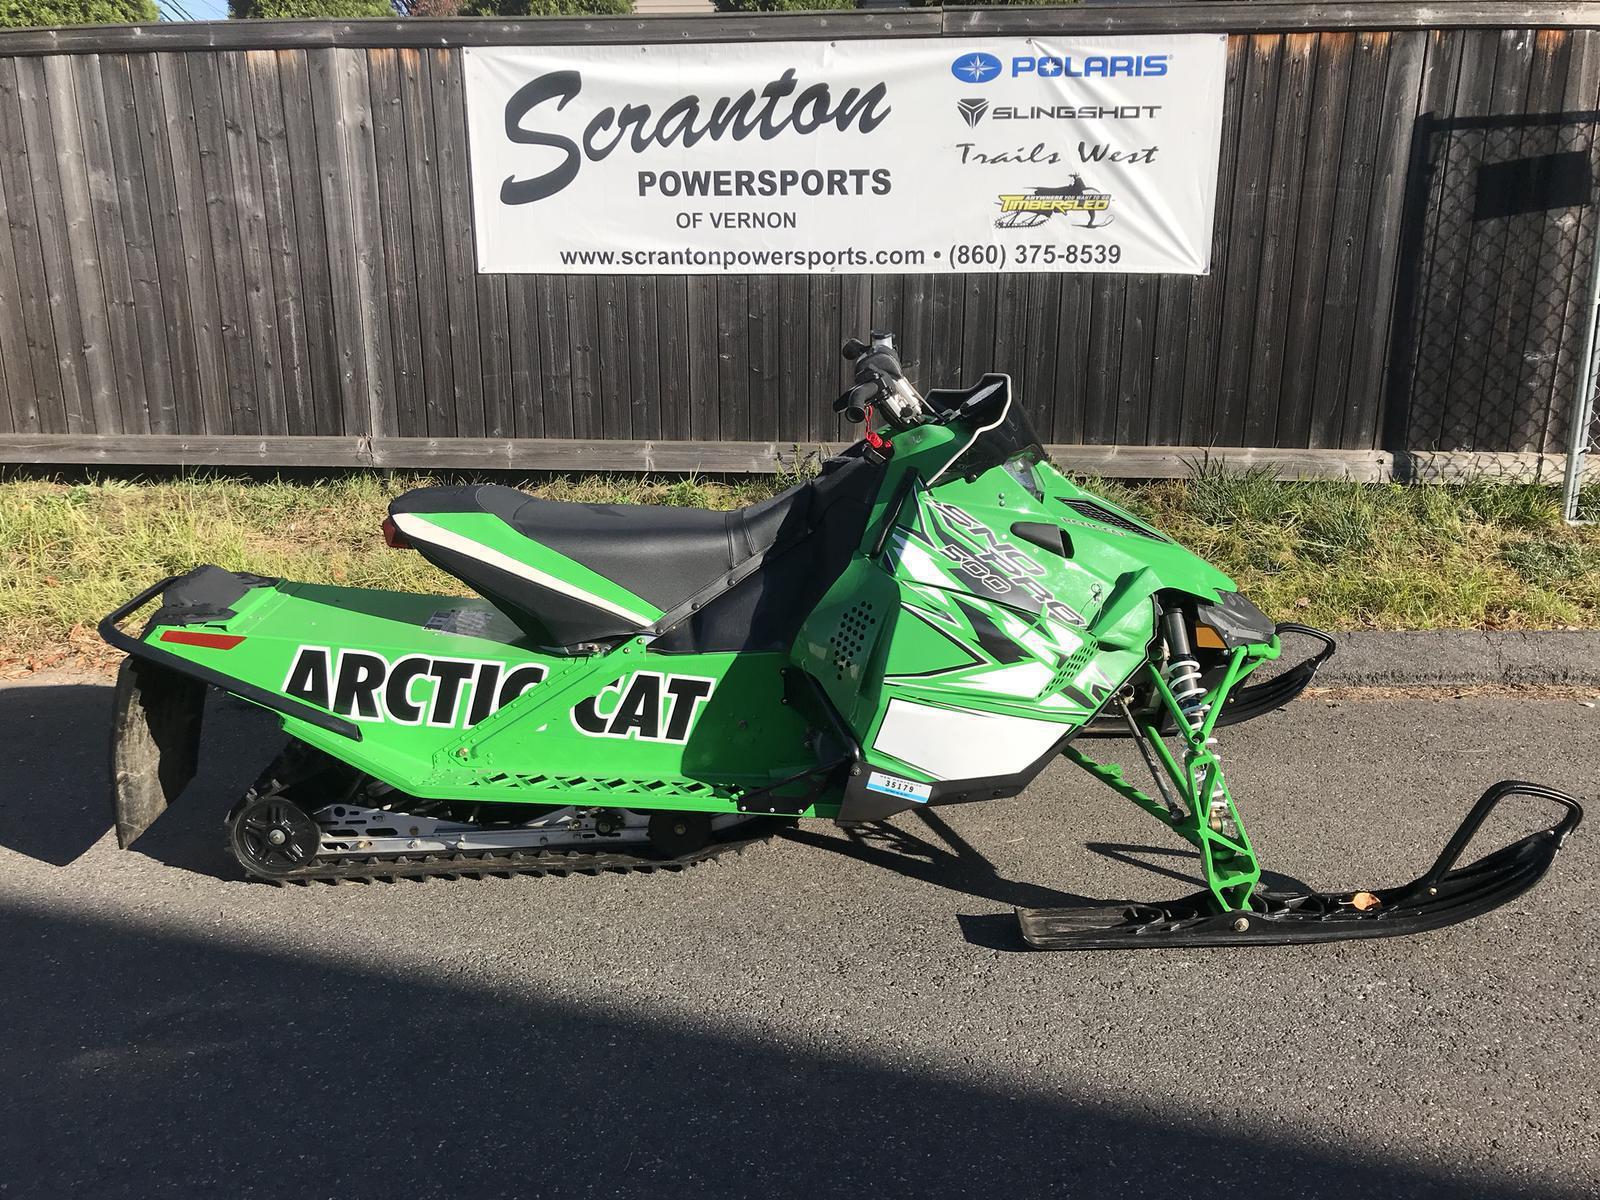 Used Snowmobile Scranton Powersports Vernon, CT (860) 375-8539